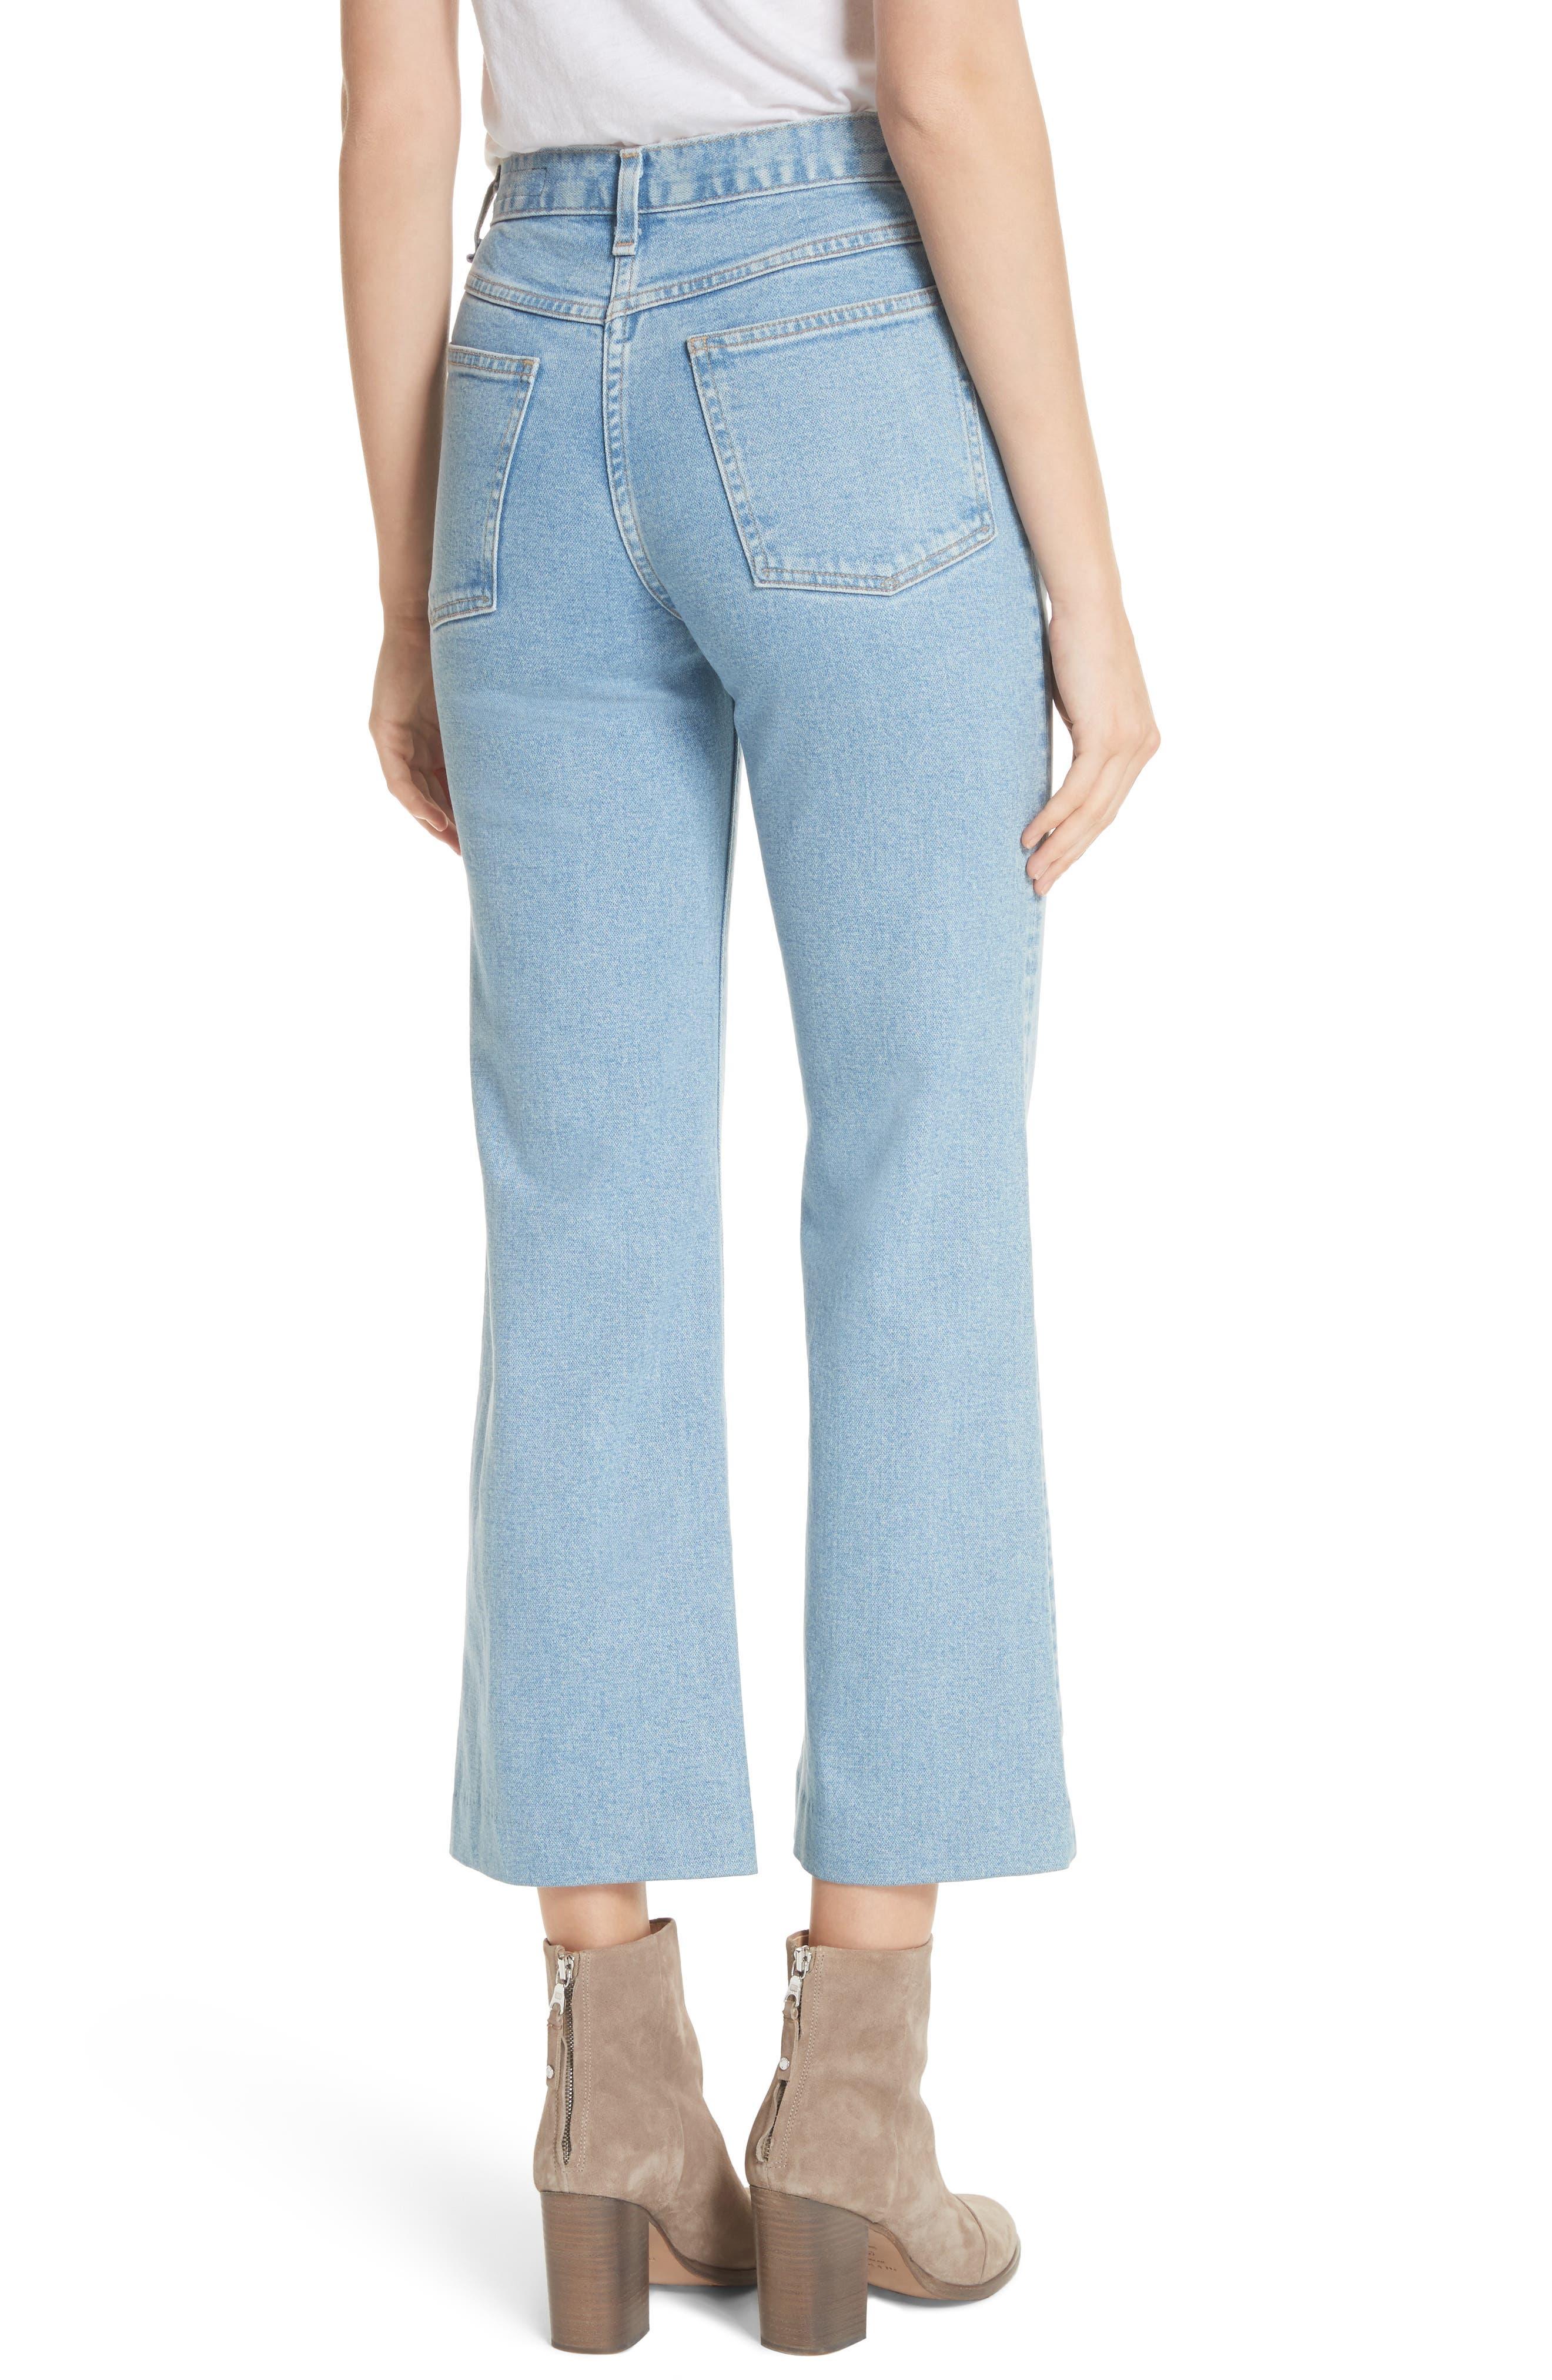 Justine High Waist Wide Leg Trouser Jeans,                             Alternate thumbnail 2, color,                             450